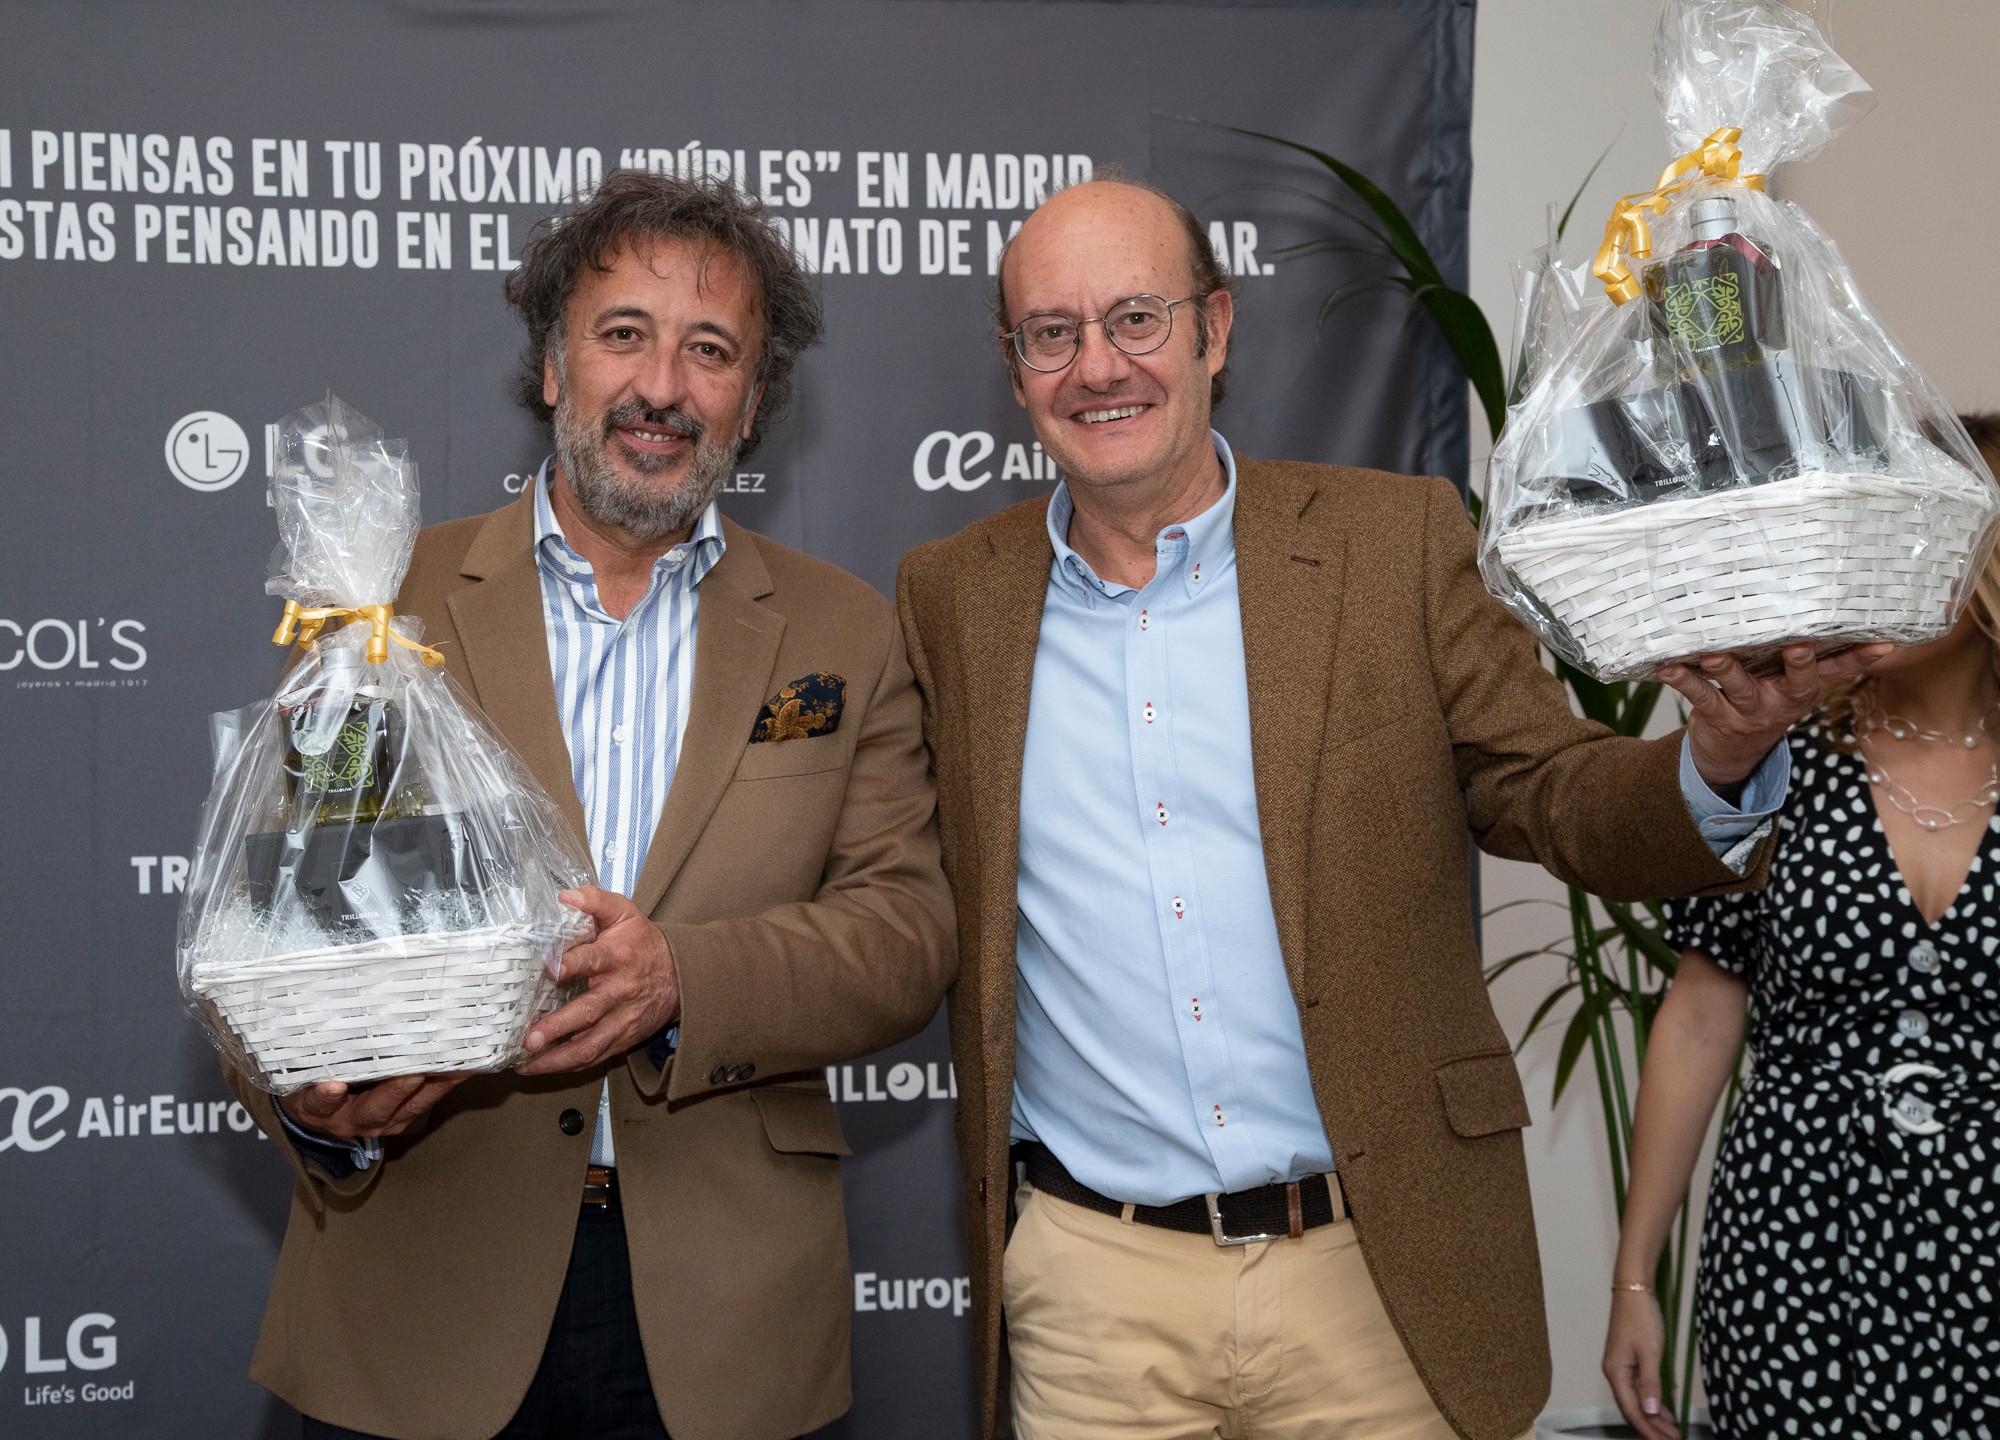 Premio Trilloliva